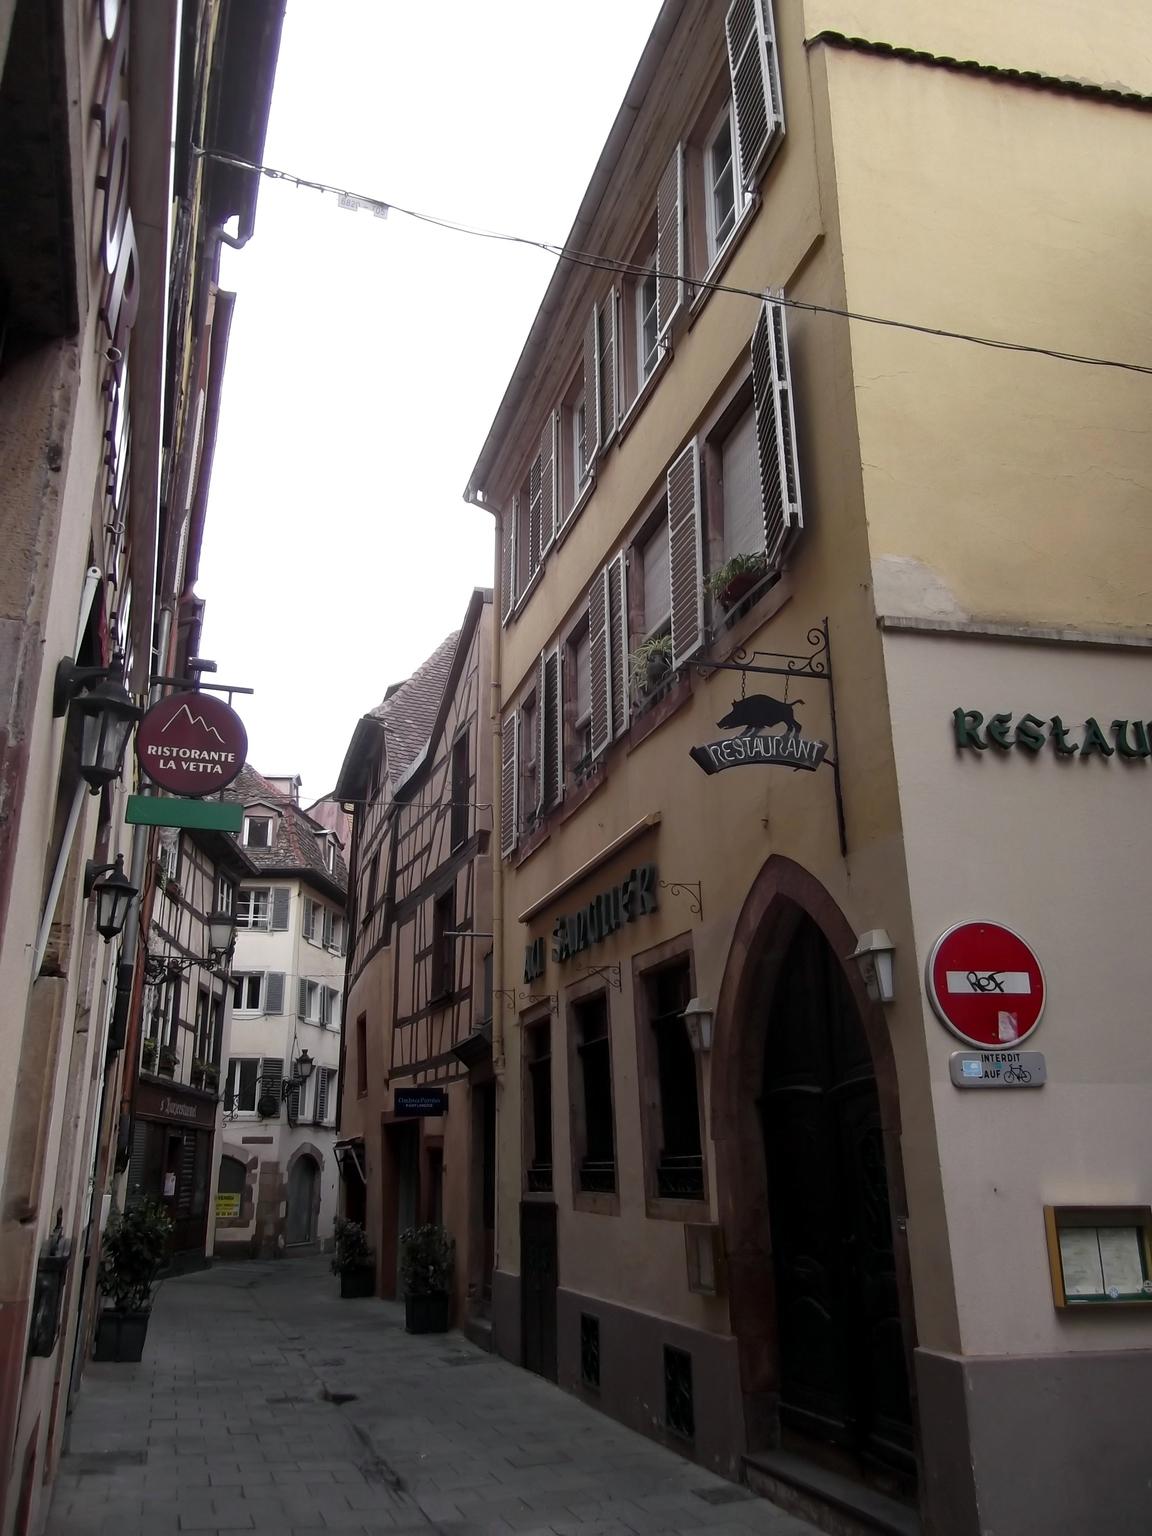 Maisons de strasbourg 11 rue du sanglier for Rue du miroir strasbourg